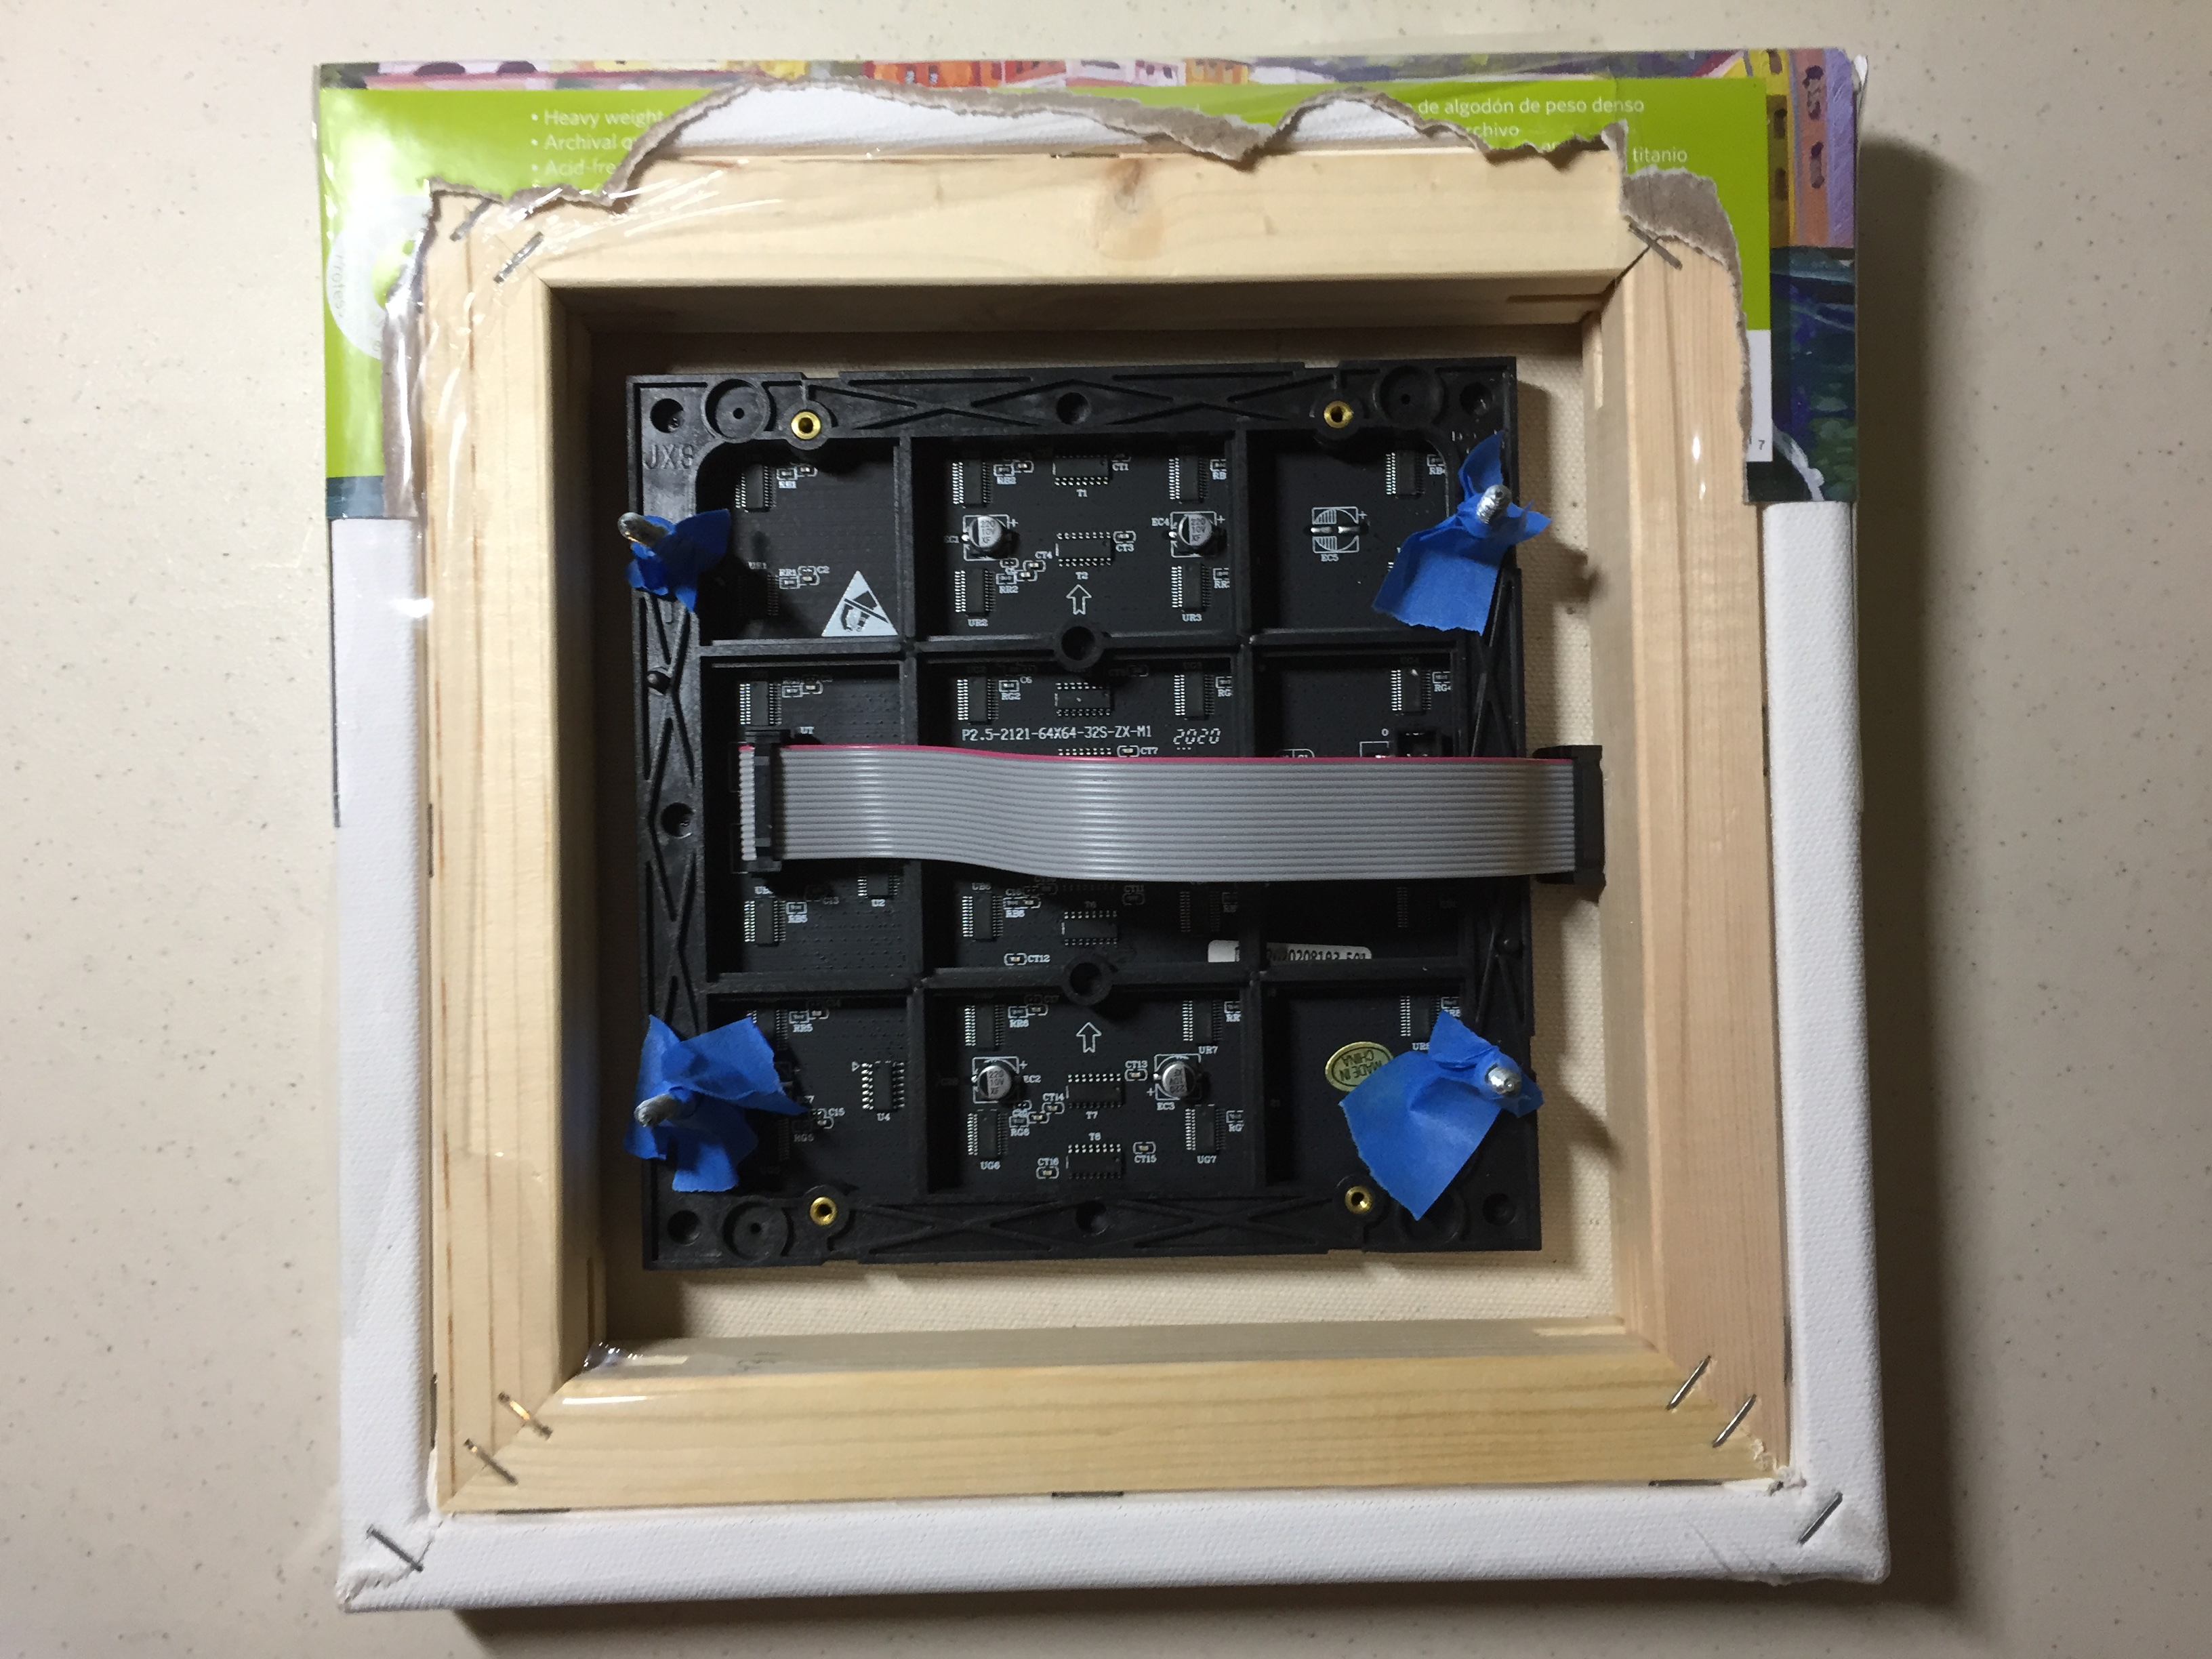 circuitpython_IMG_6273.jpg